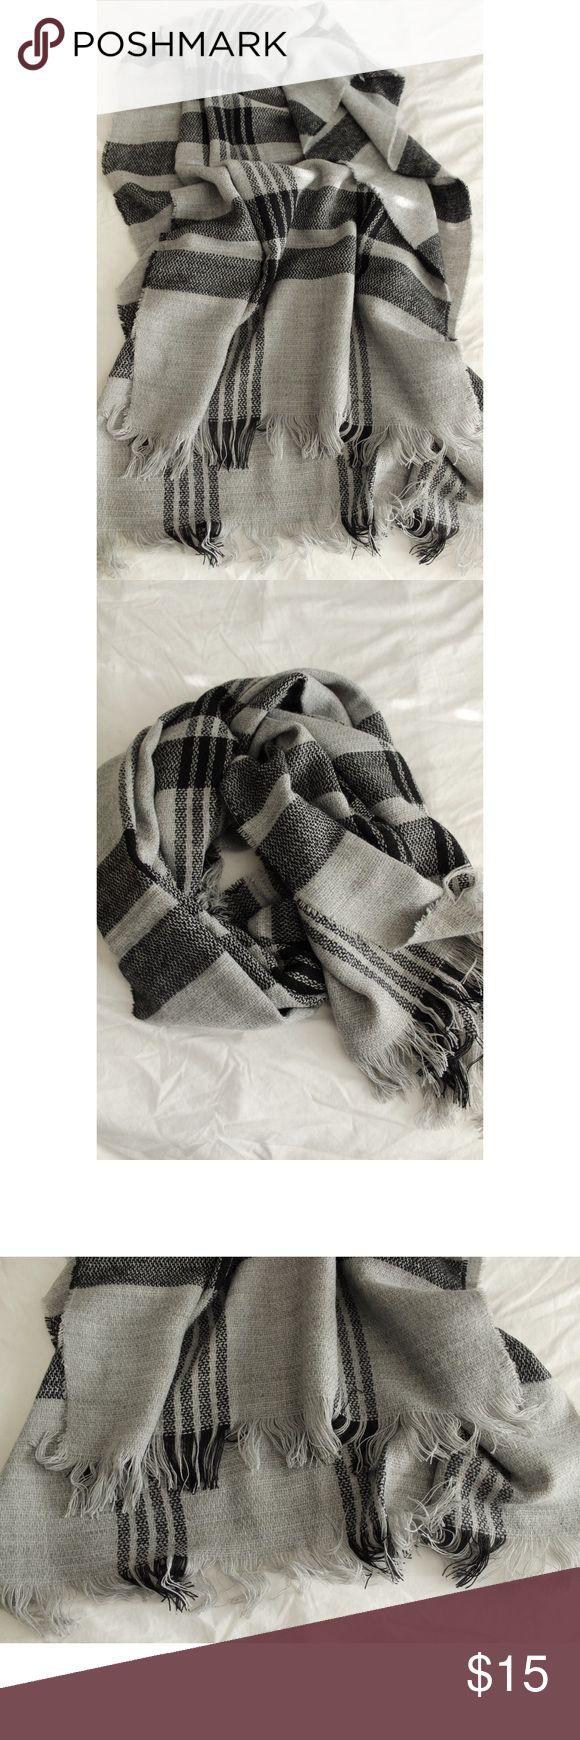 Best 25+ Pashmina scarf ideas on Pinterest   Fulares con ...